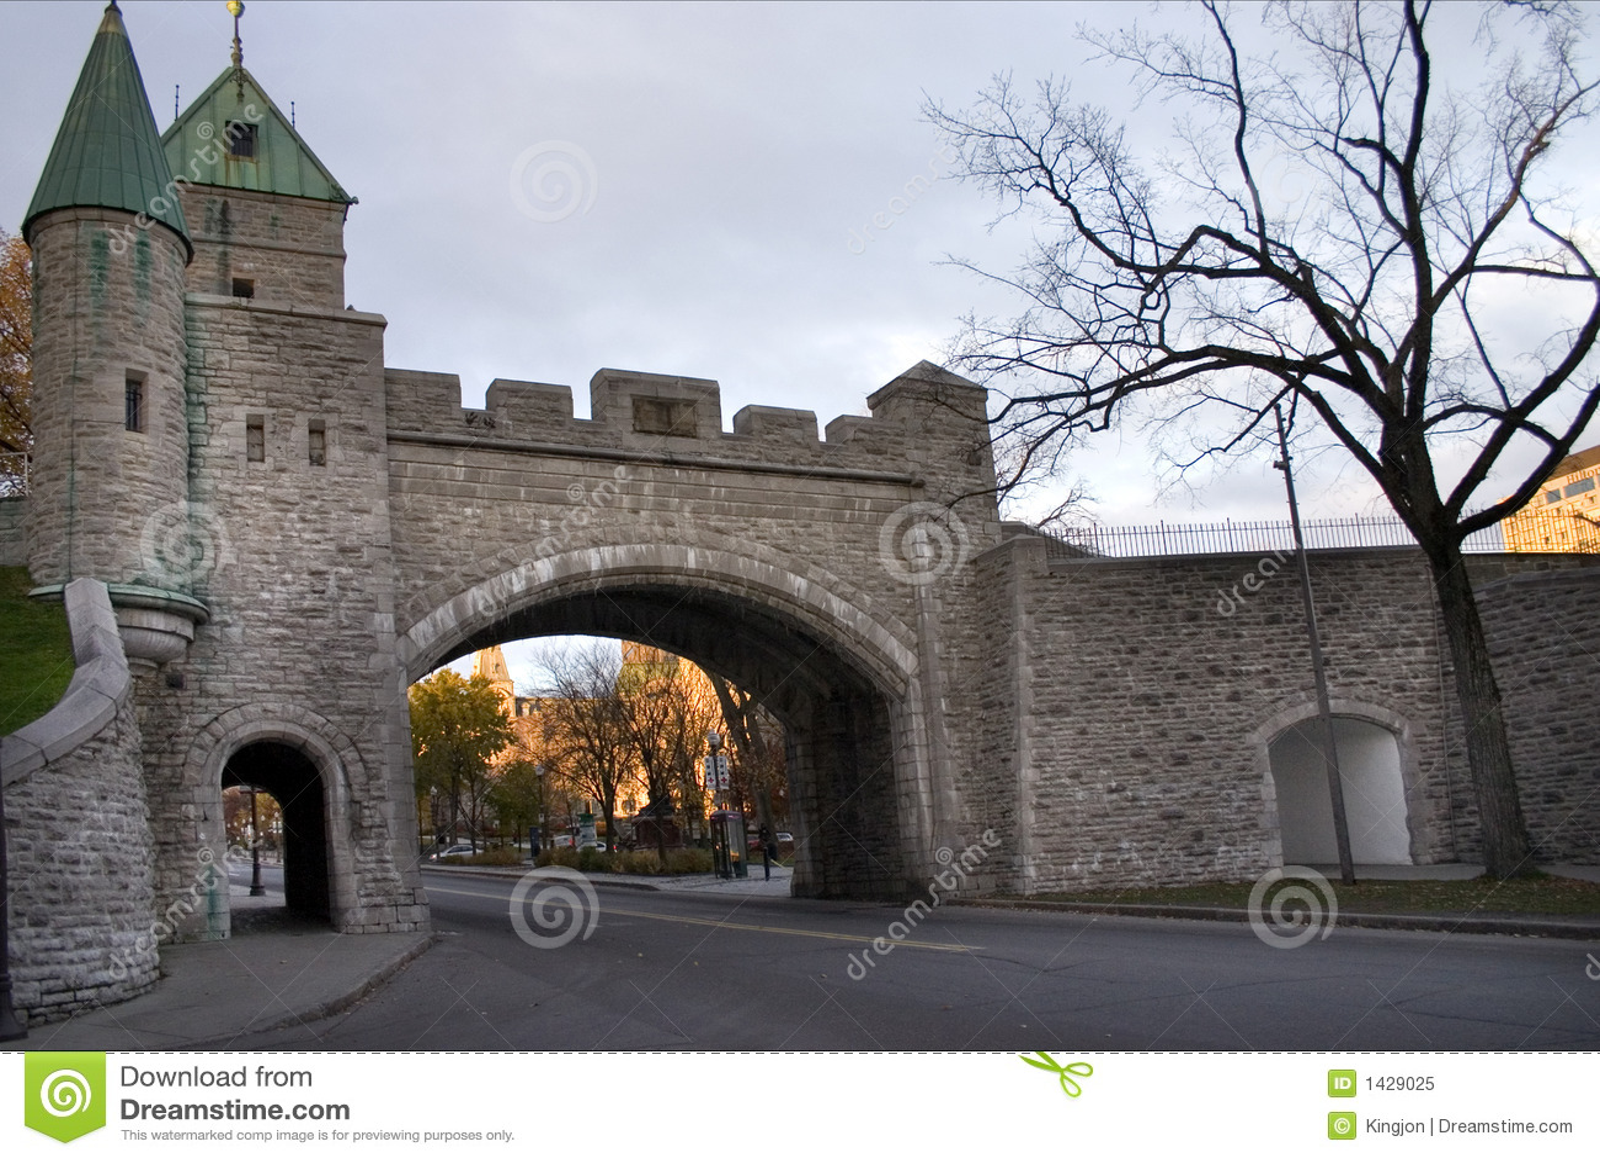 Quebec City Wall